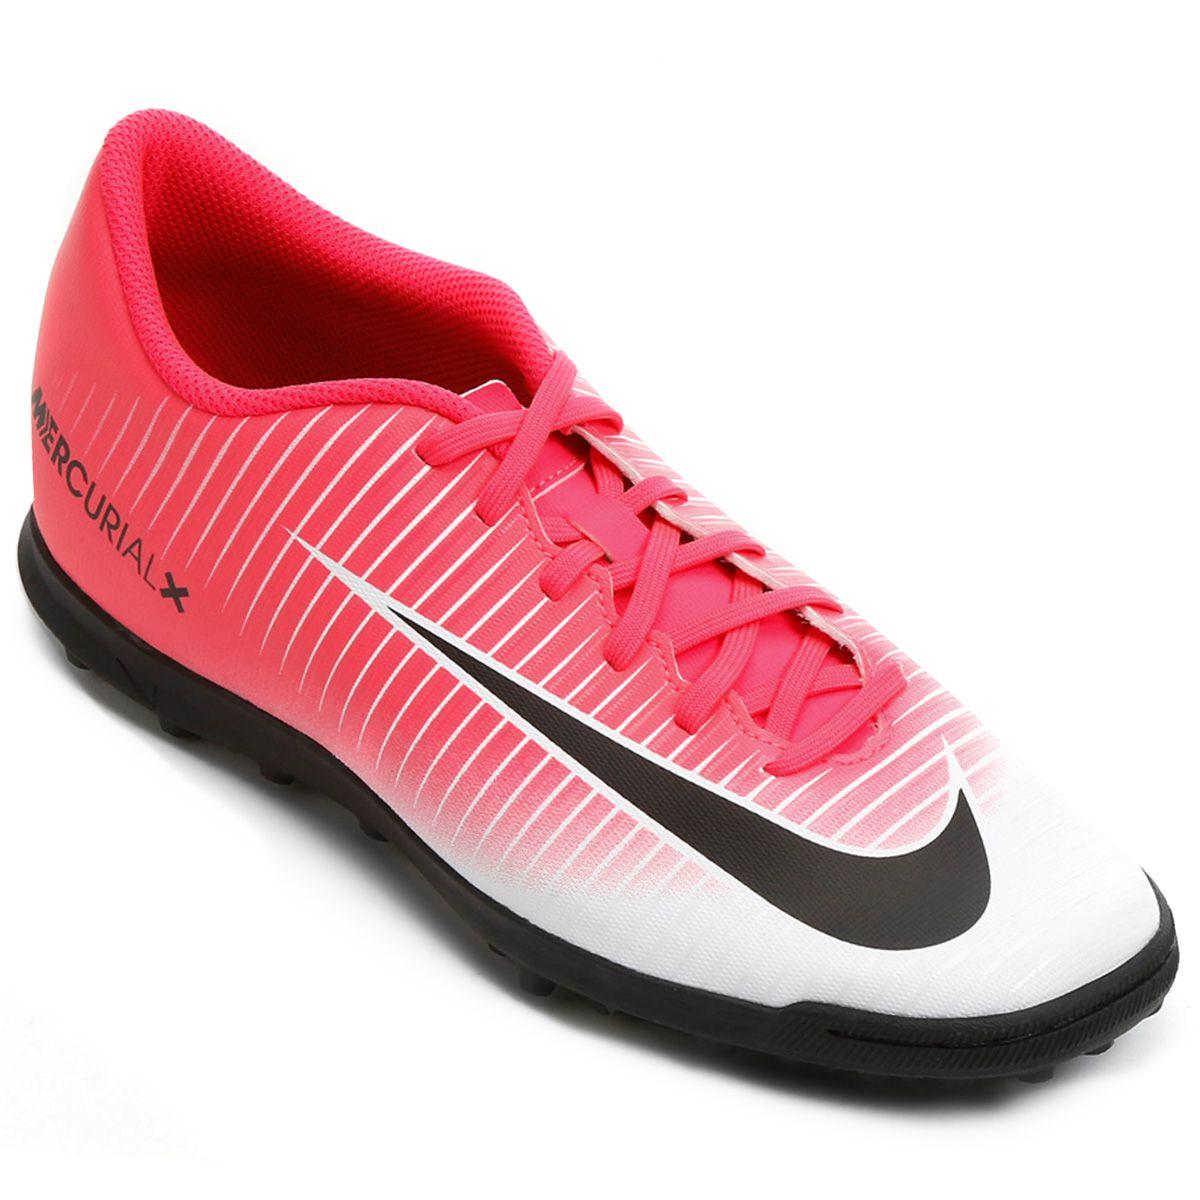 Chuteira Nike Mercurial X Vortex Iii Tf Society 831971601